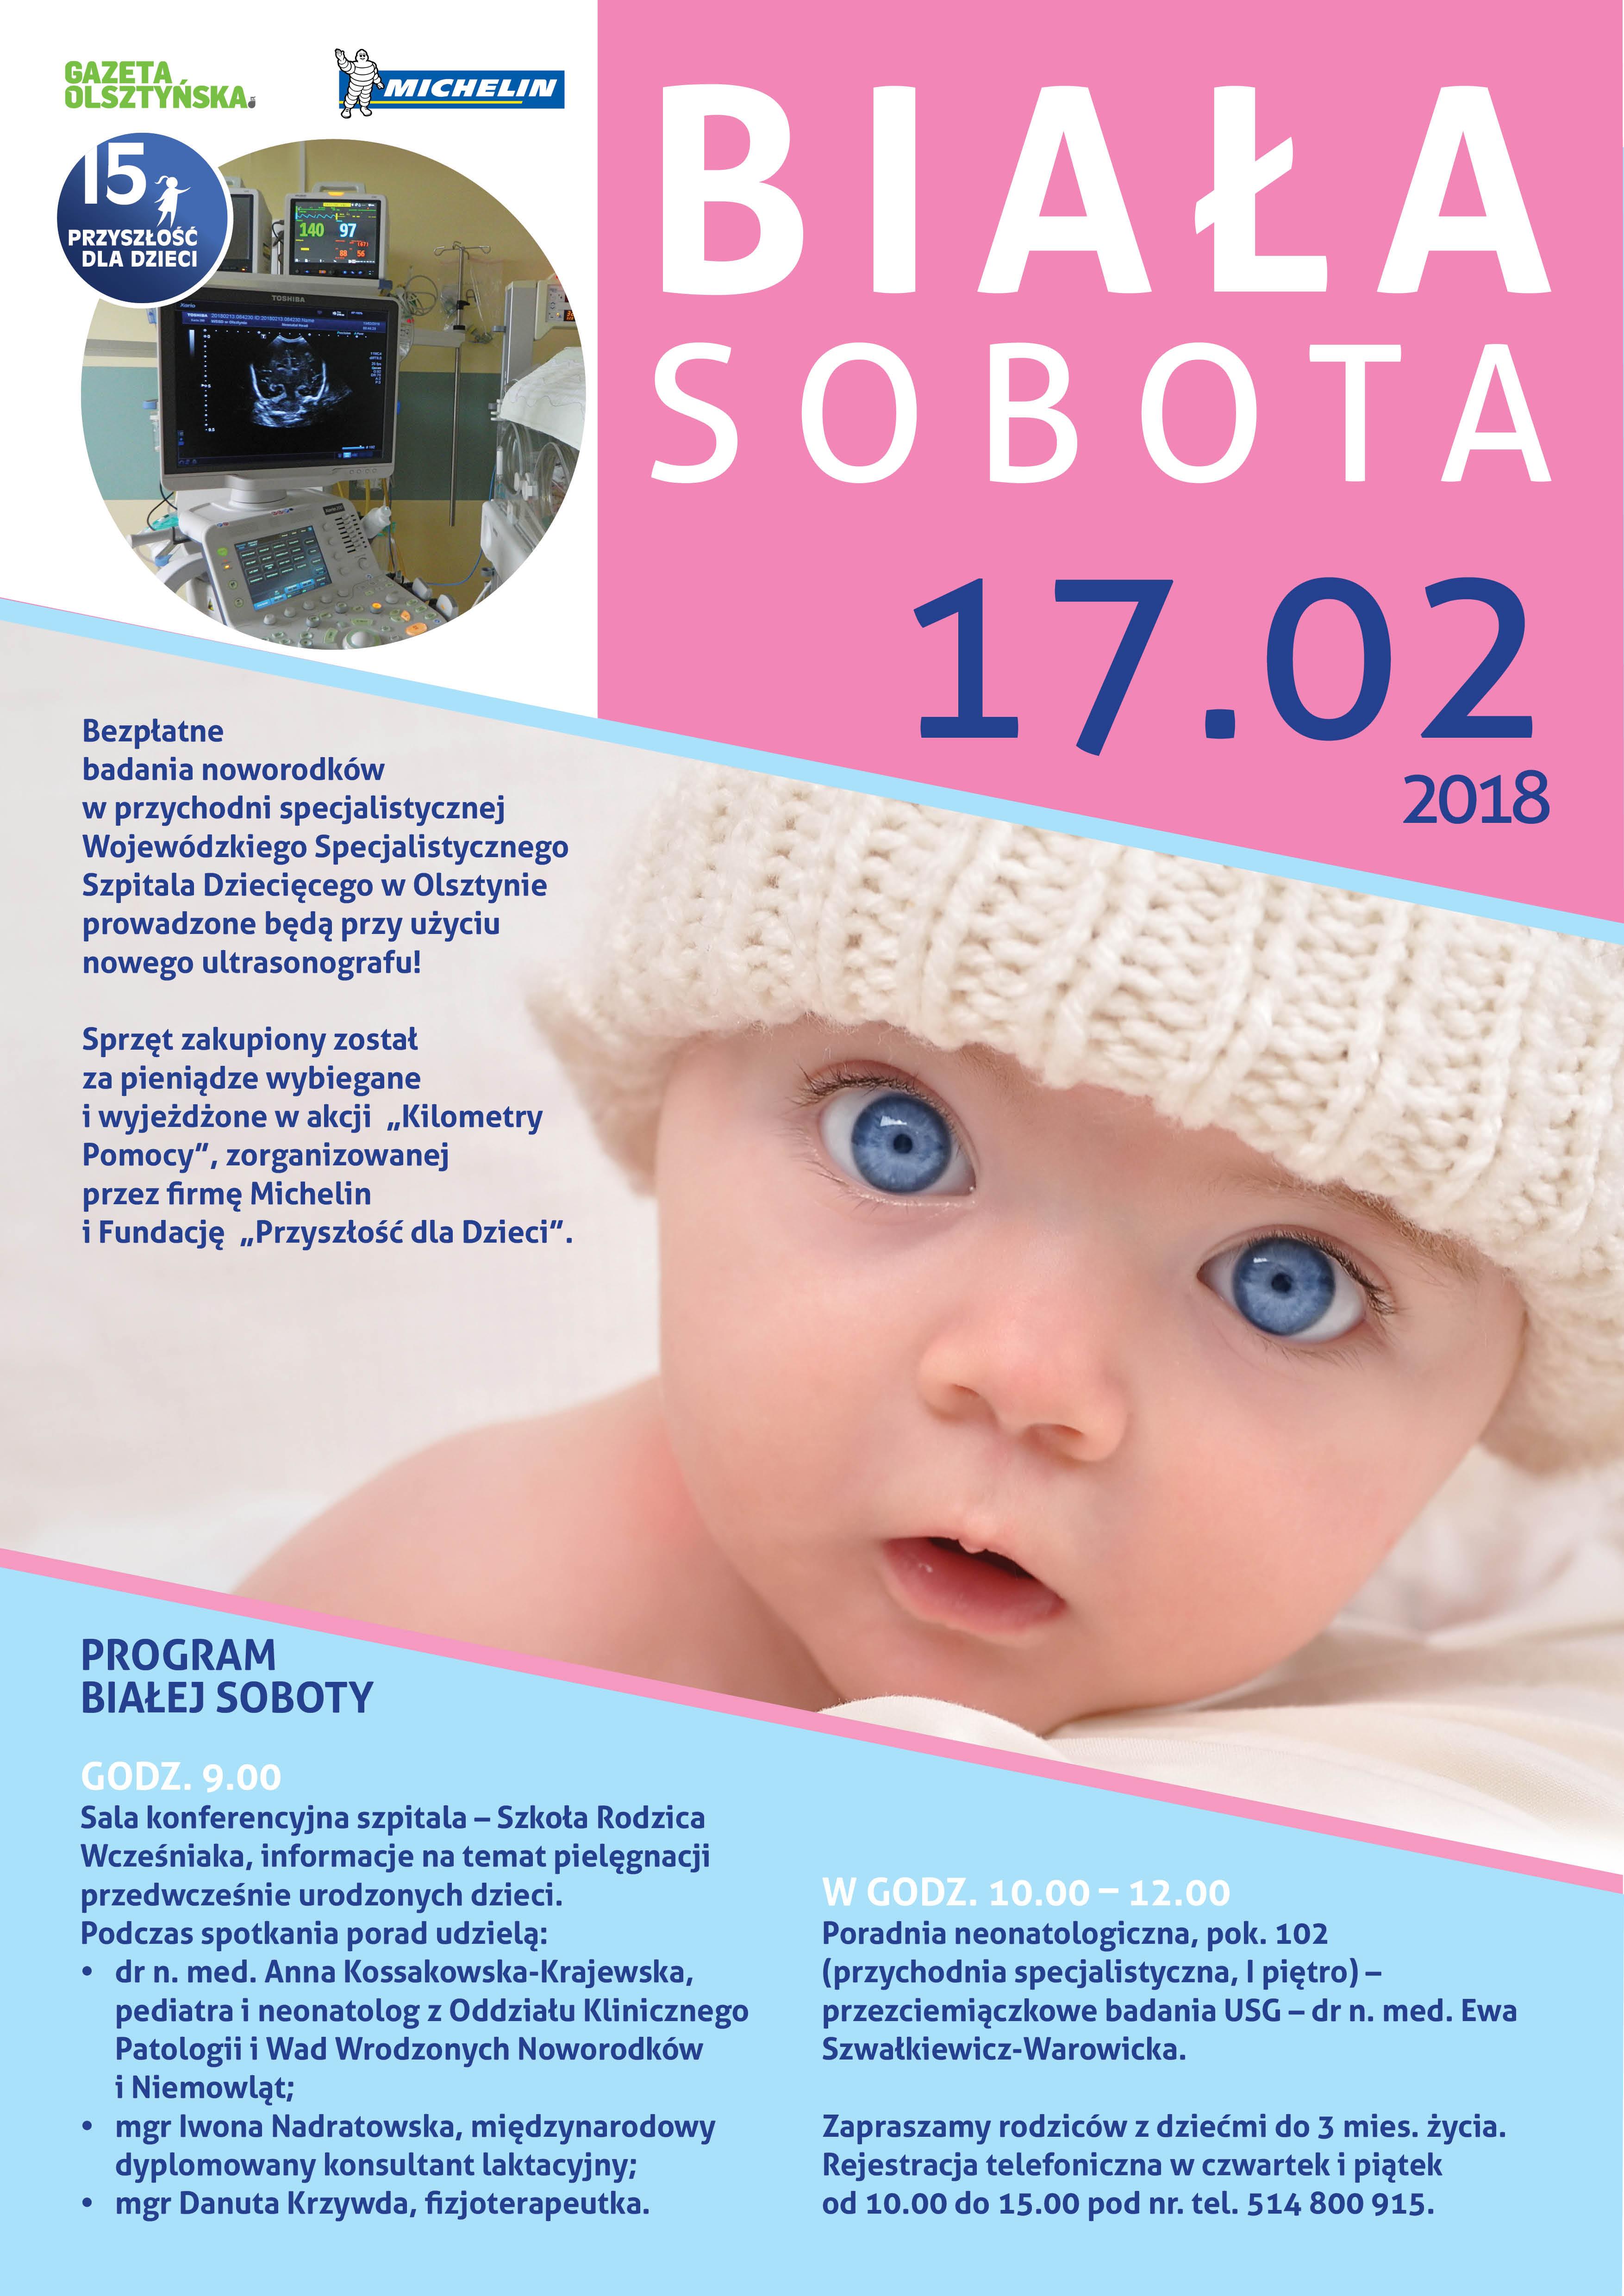 http://m.wm.pl/2018/02/orig/plakat-fundacja-2018-bialasobota-446857.jpg